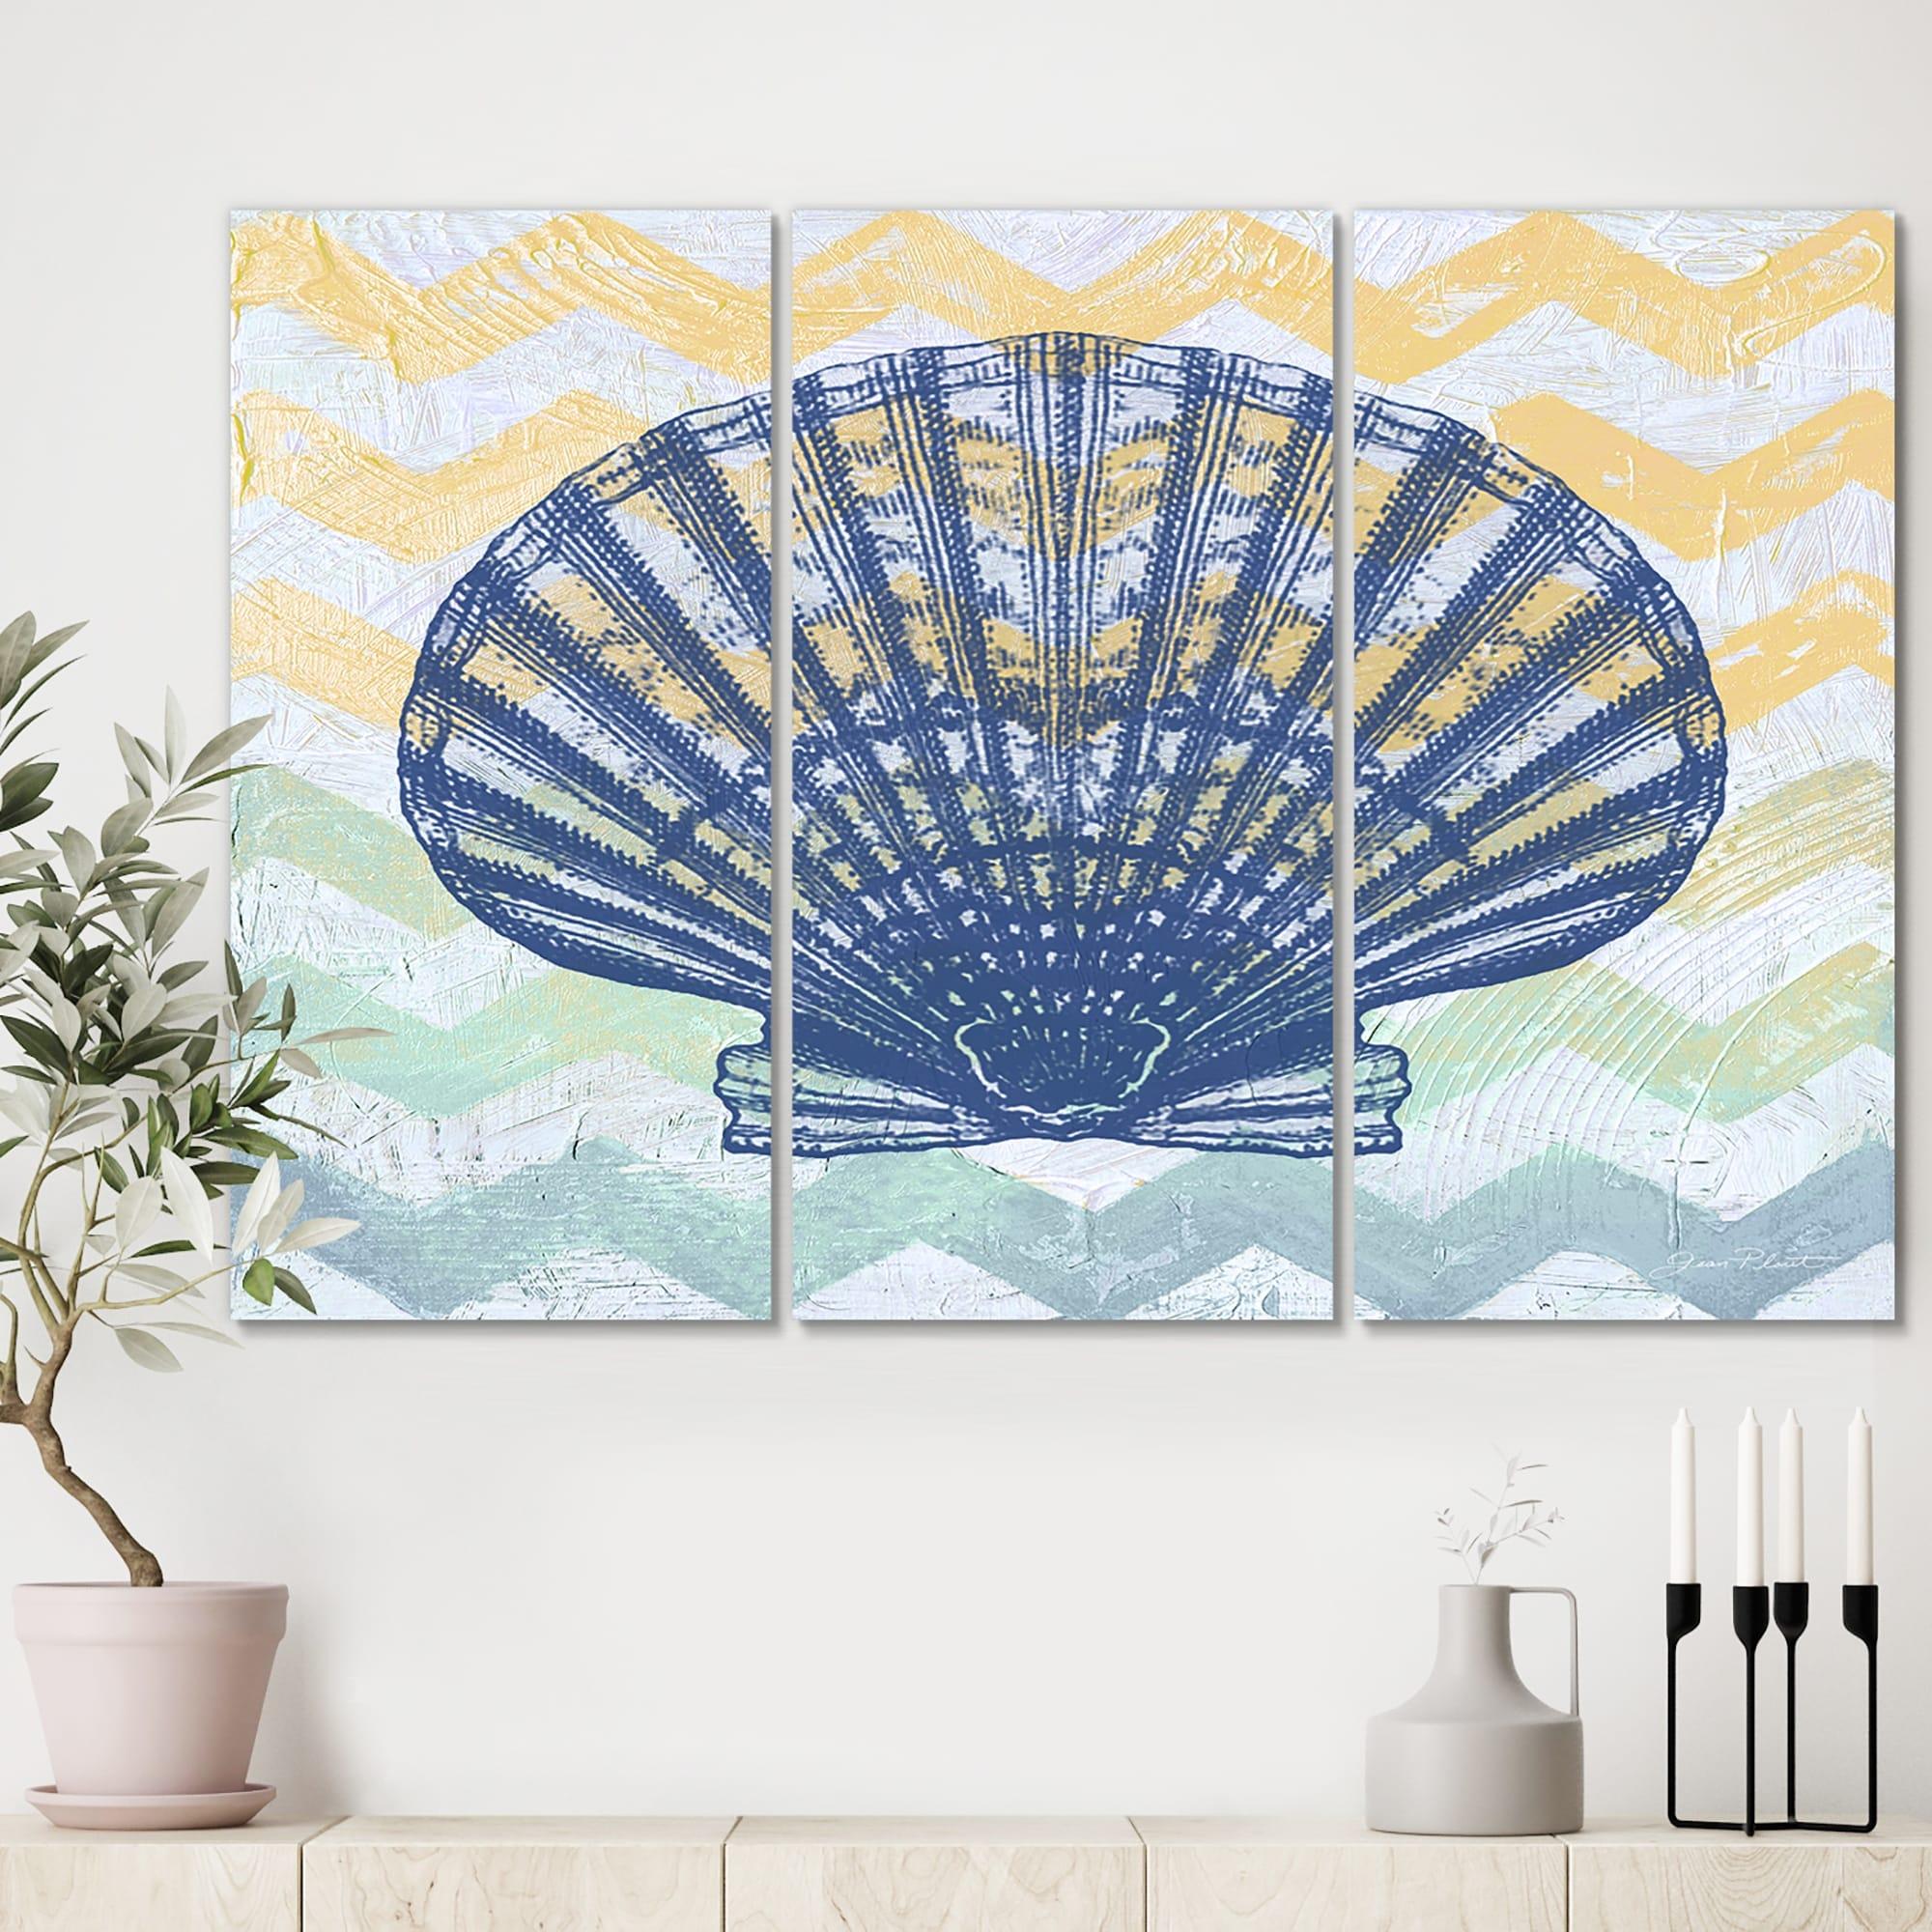 Designart Chevron Shell Nautical Coastal Canvas Wall Art 36x28 3 Panels On Sale Overstock 28456408